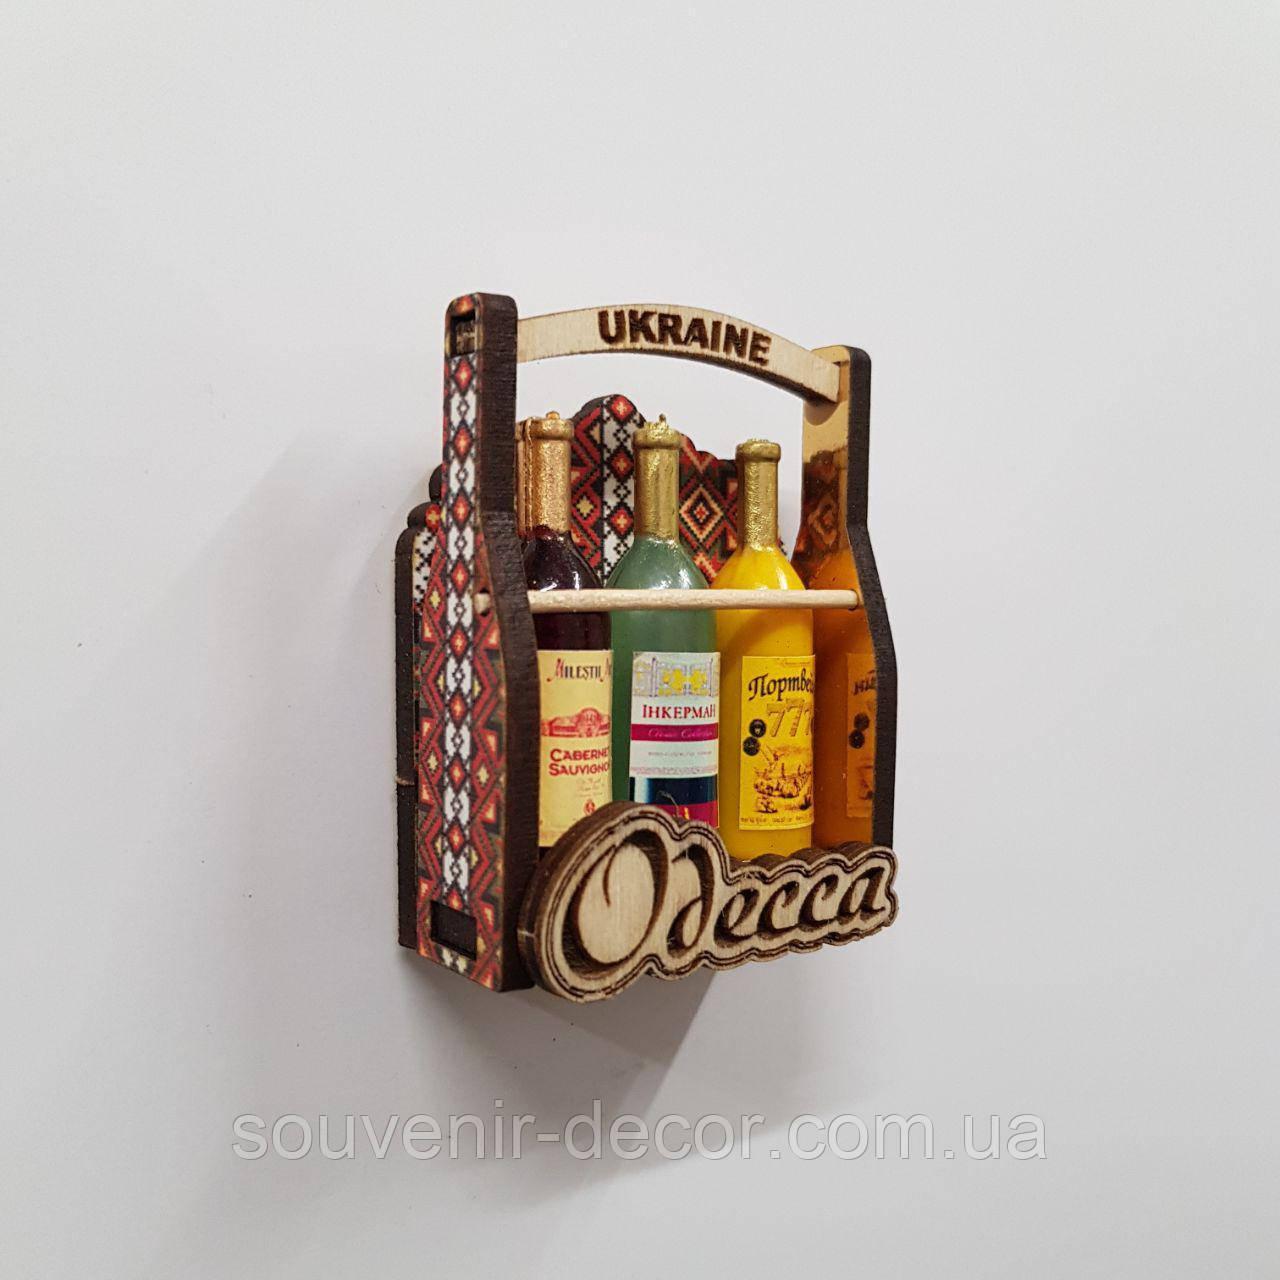 Магніт з 3 пляшками Одеса друк